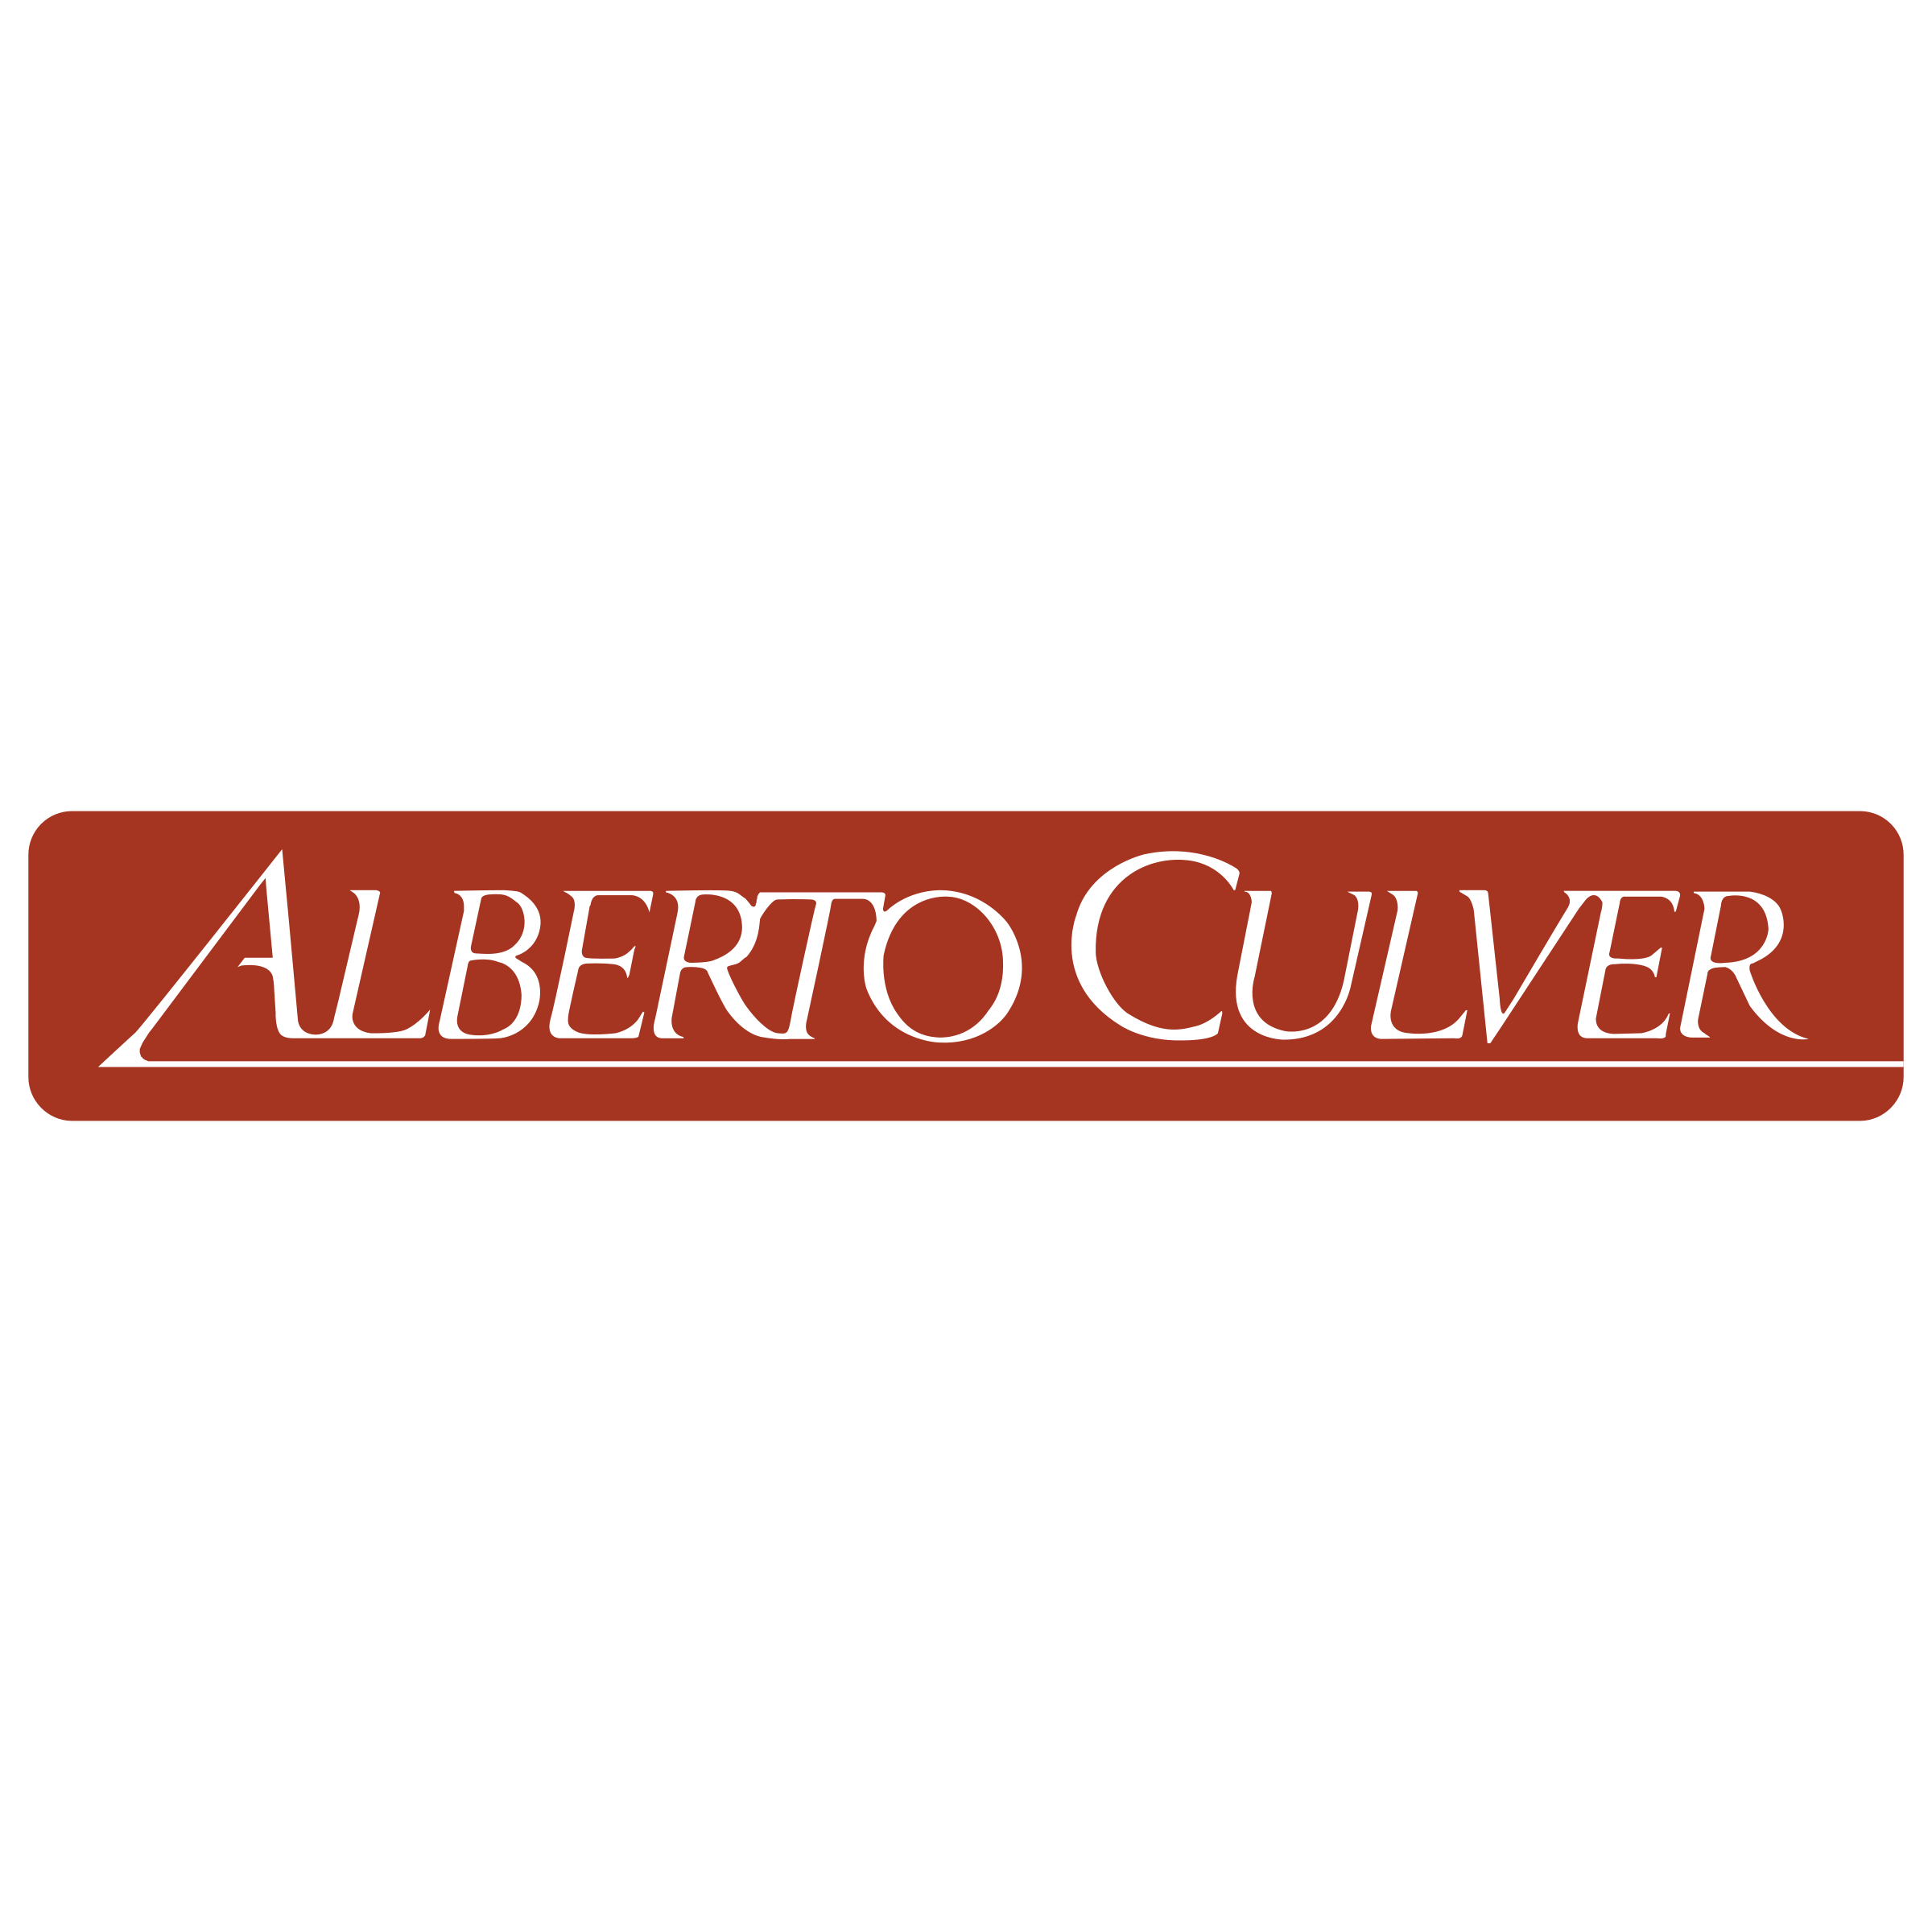 Alberto-Culver logo